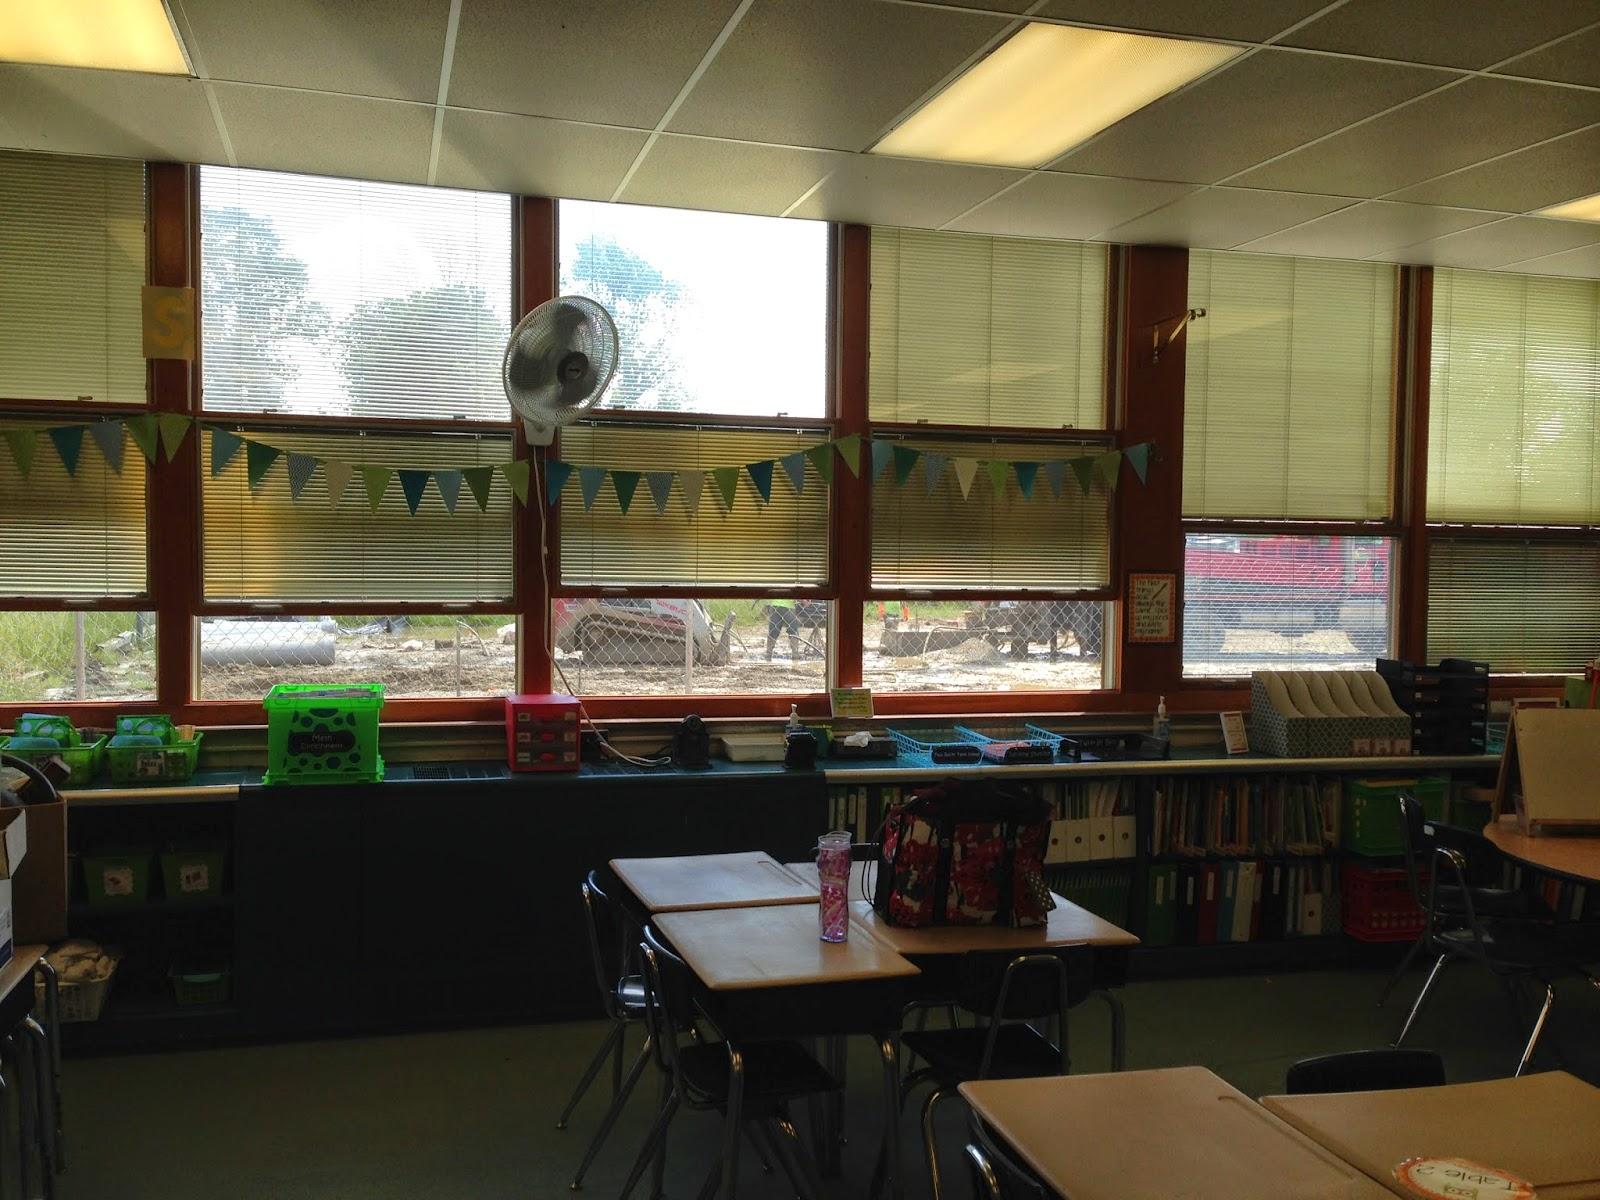 Classroom window - I Used Clear Command Hooks To Hook It To The Windows Ta Da